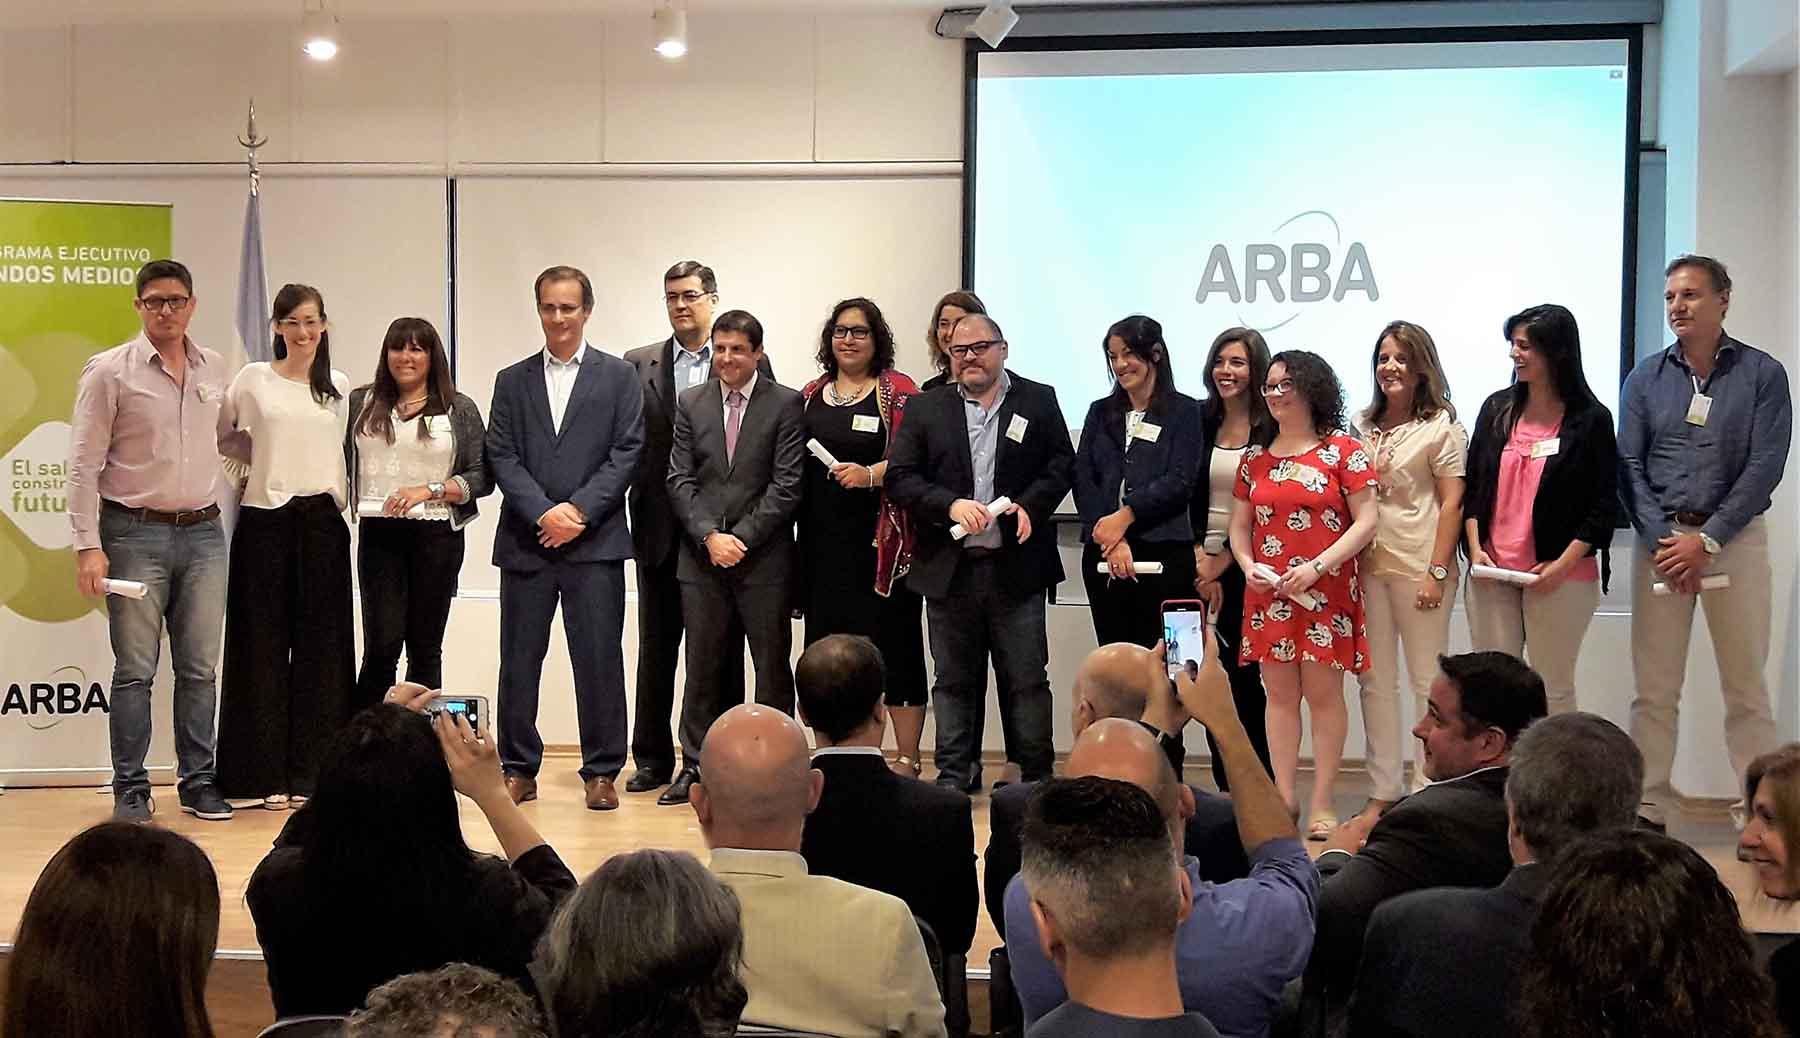 Imagen de la nota Entrega de diplomas a agentes de Arba